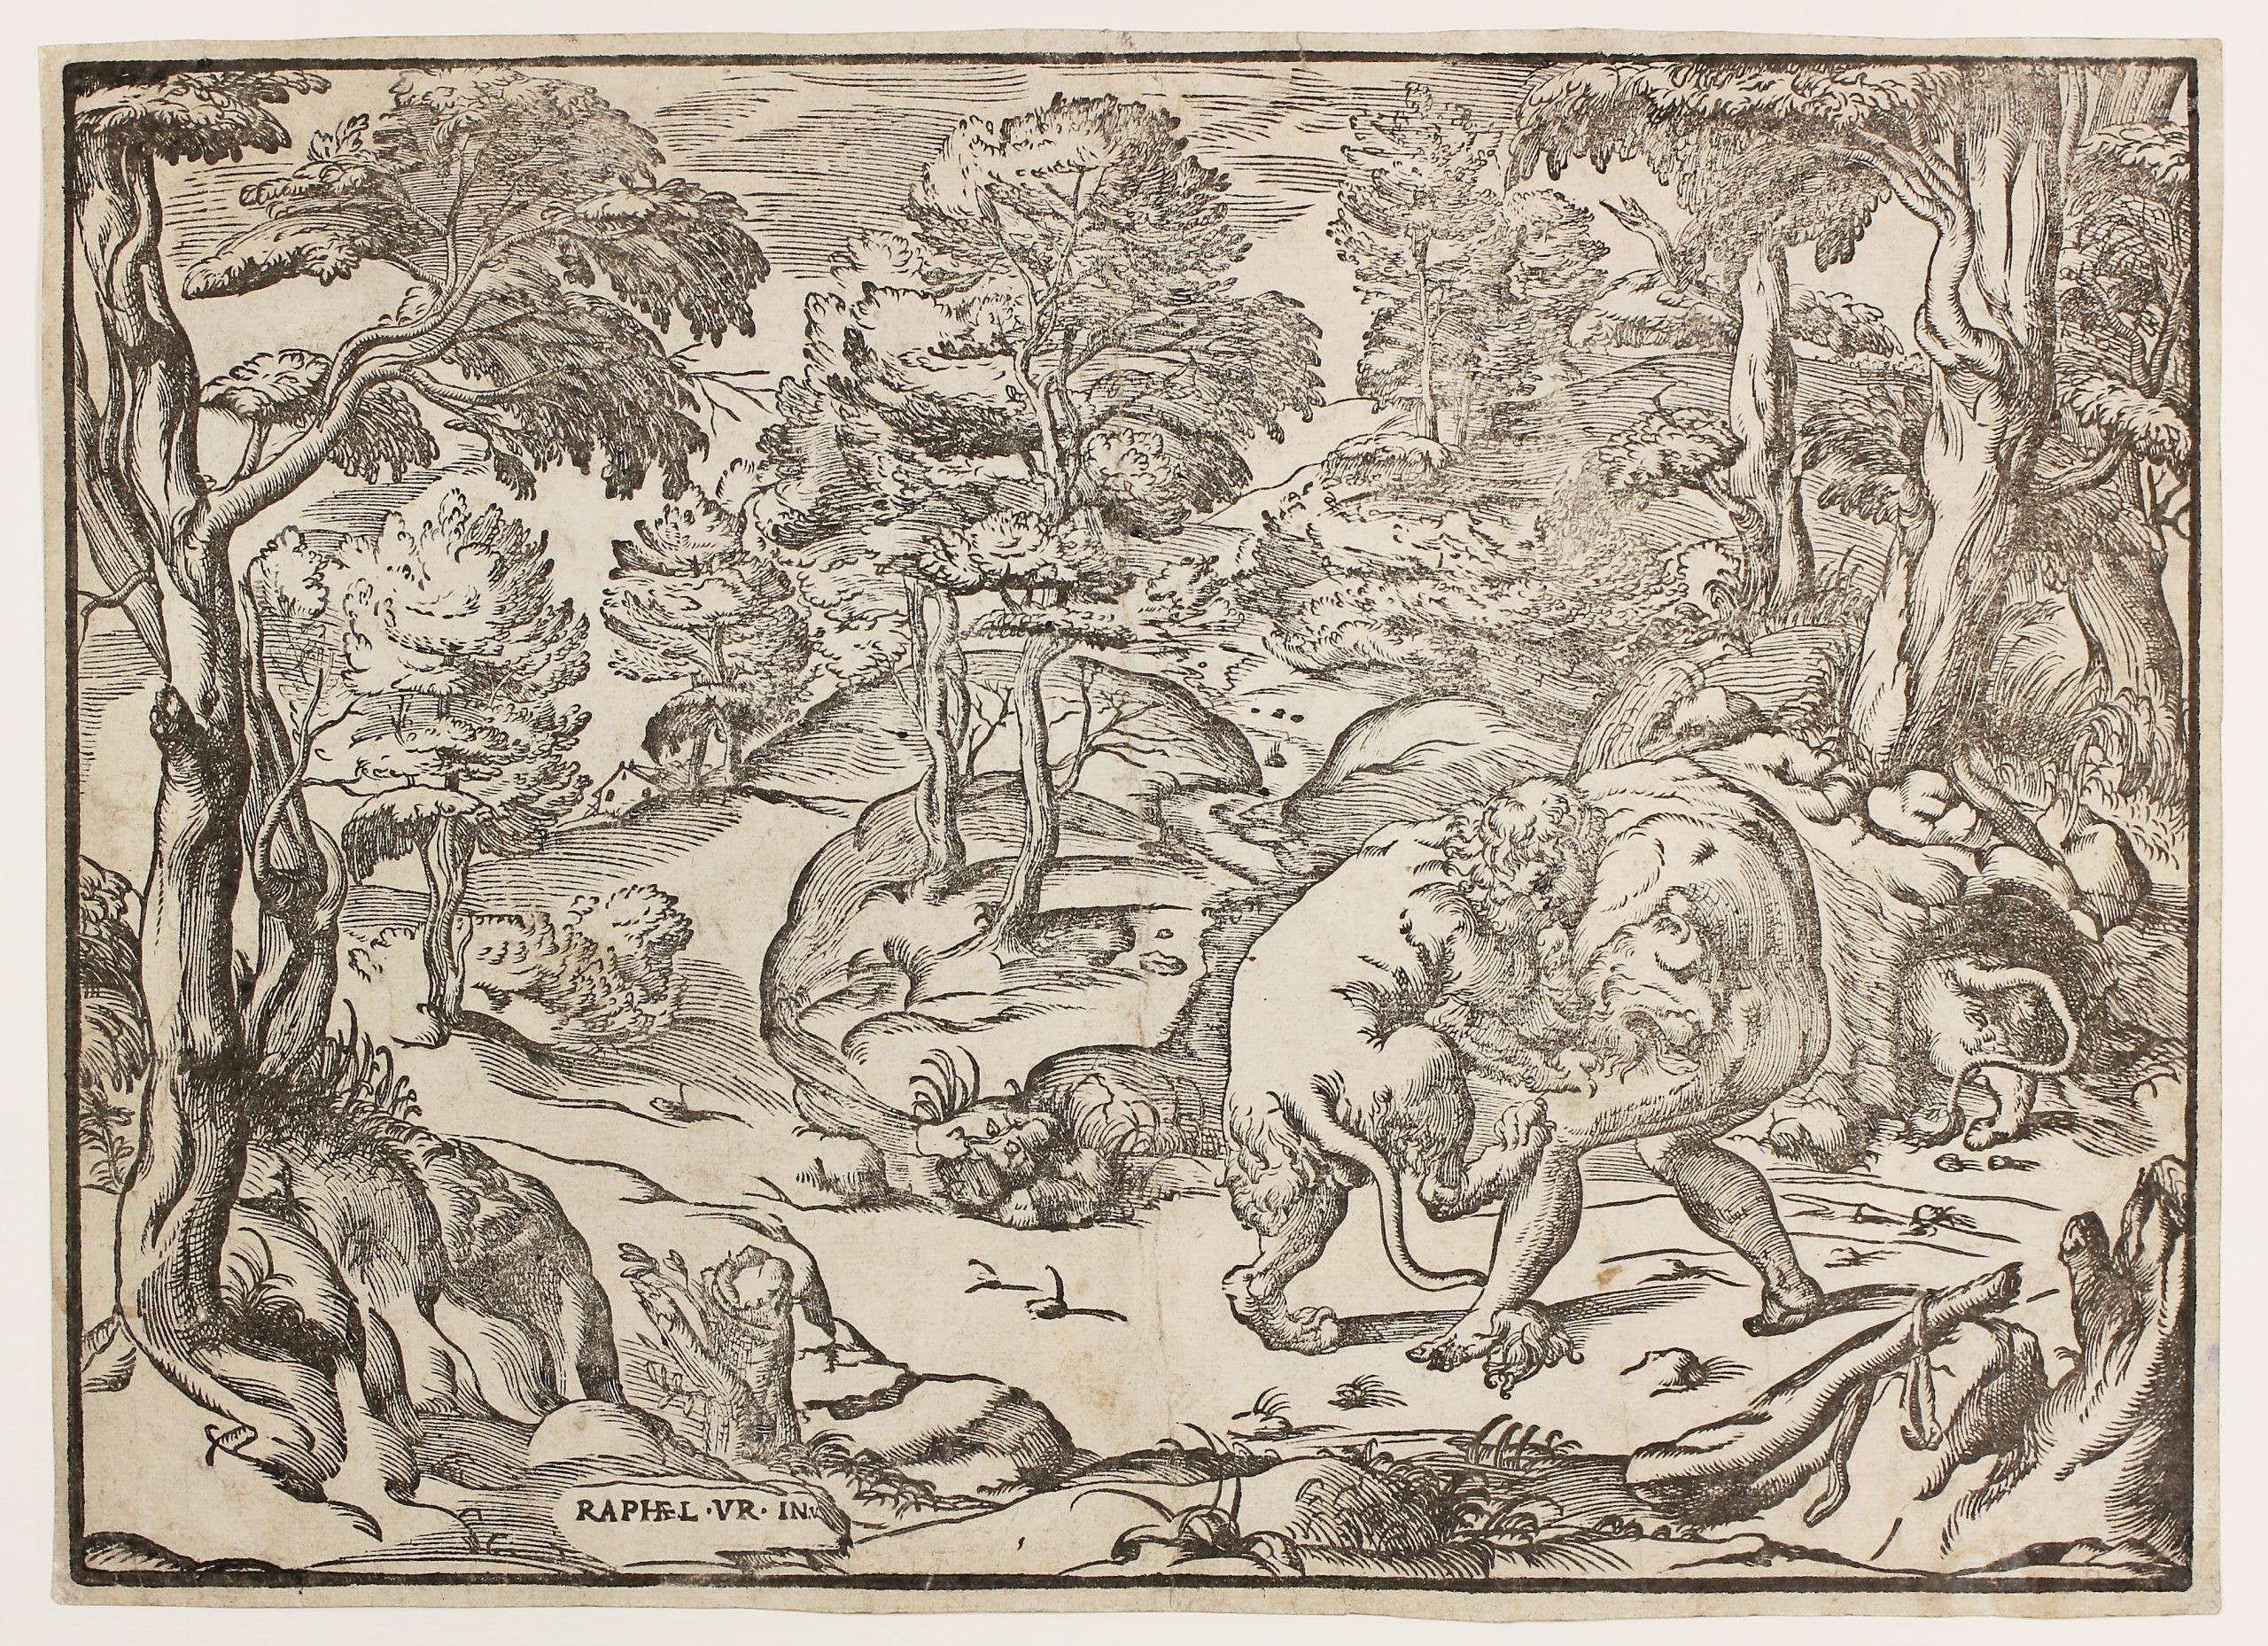 Hercules and the Nemean Lion by Niccolò Boldrini